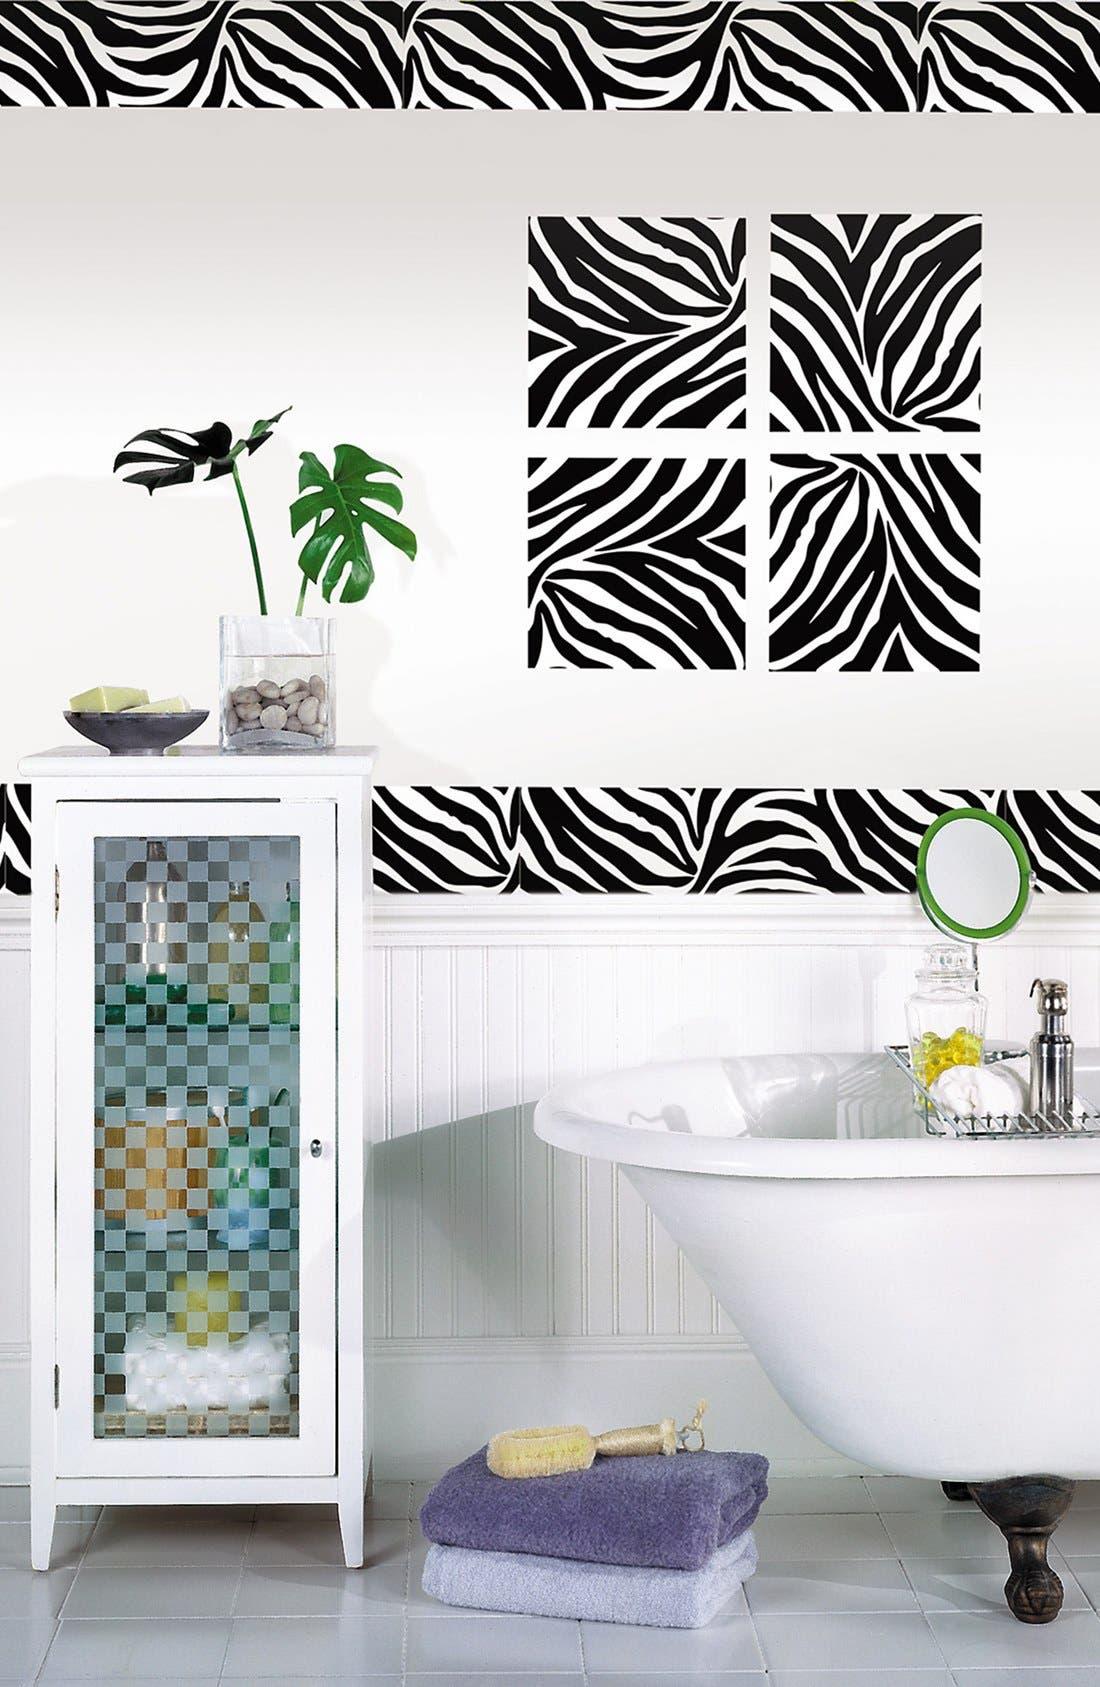 Main Image - Wallpops 'Go Wild Zebra Blox & Stripes' Wall Art